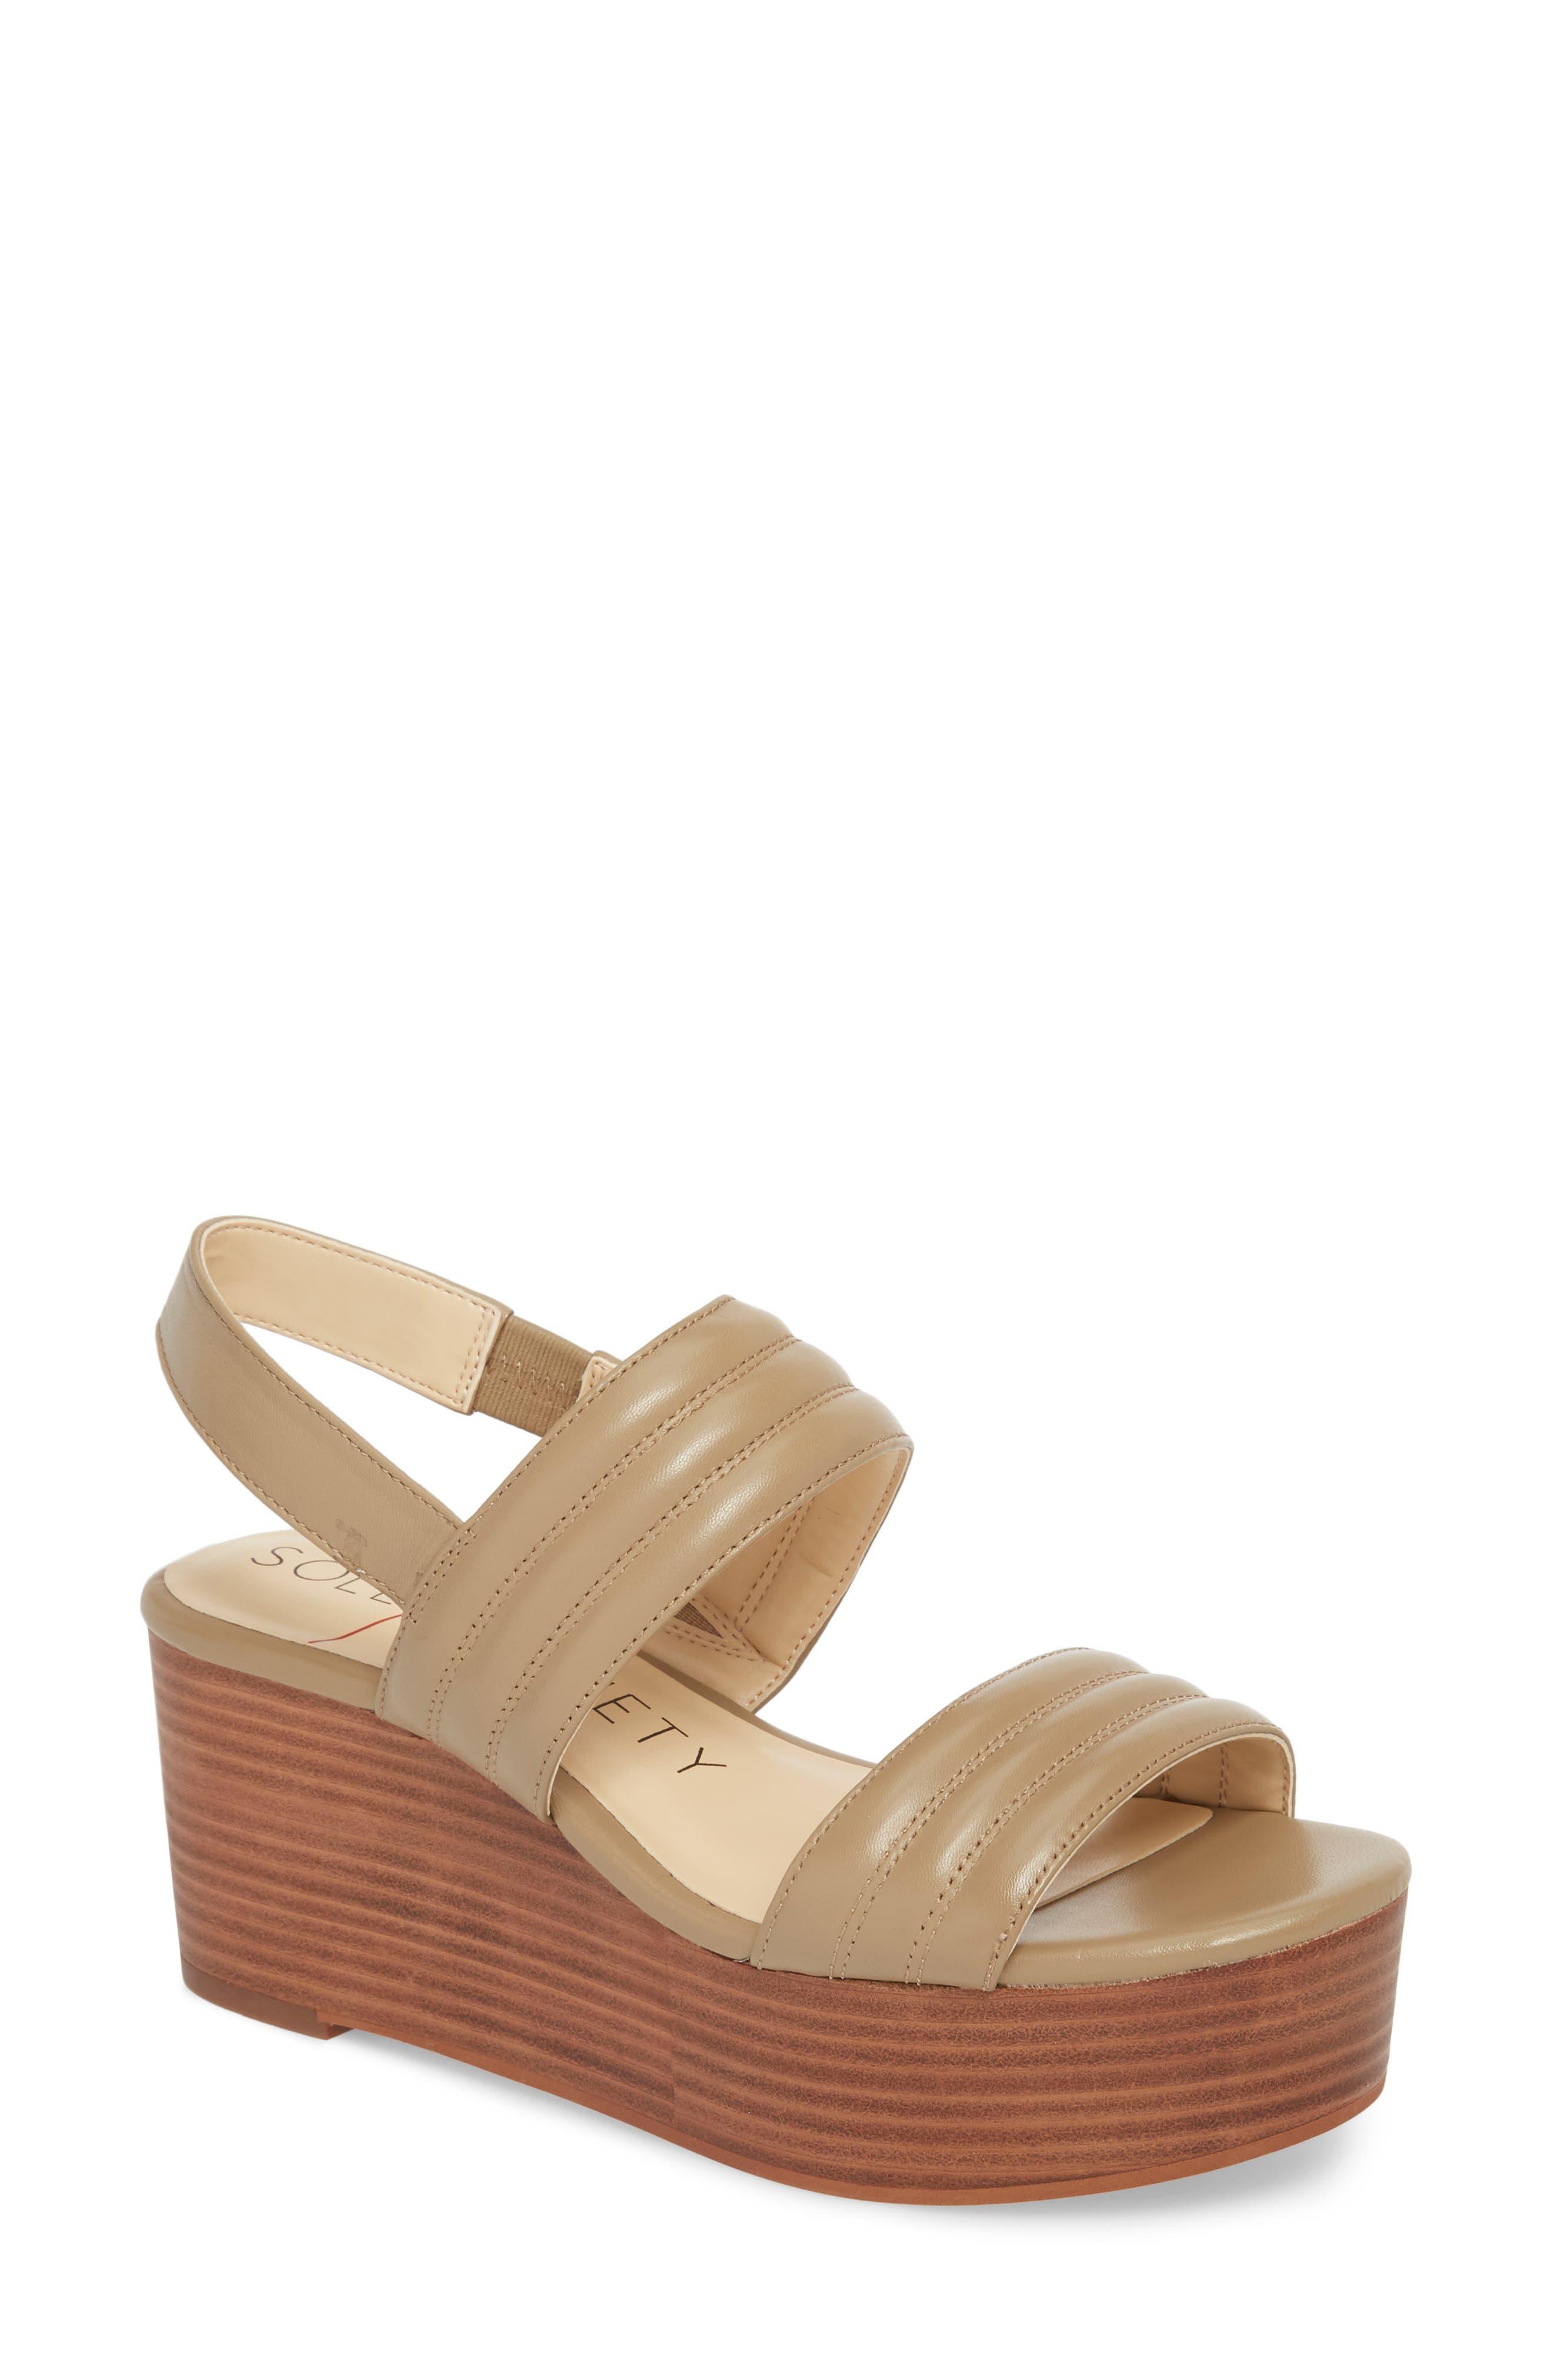 Amberly Platform Sandal,                             Main thumbnail 1, color,                             Night Taupe